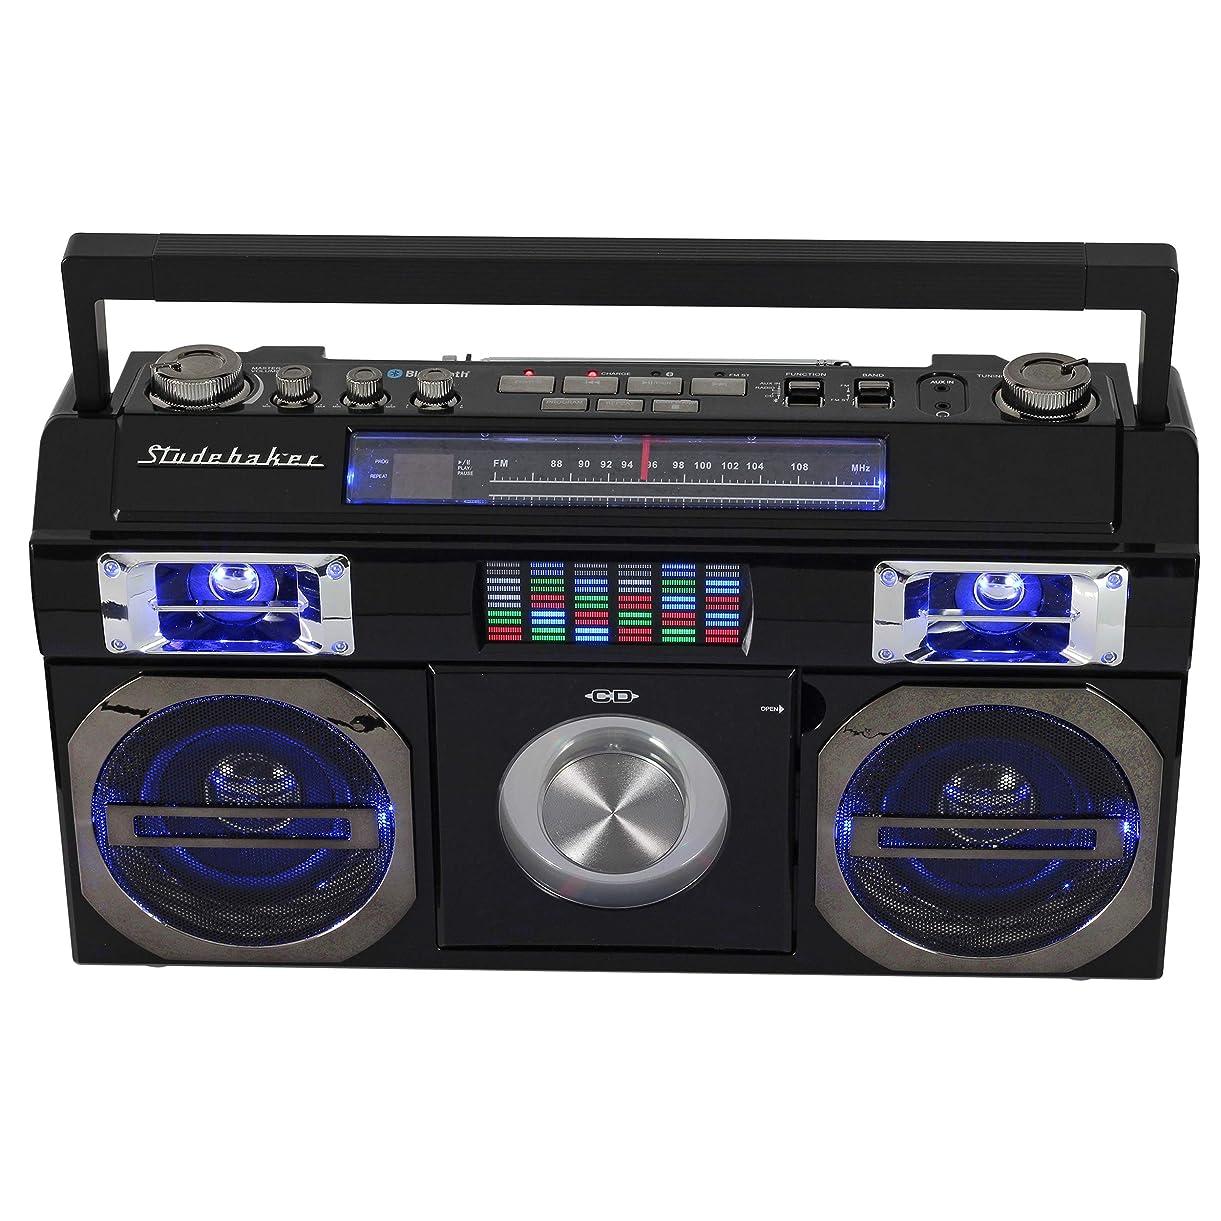 Studebaker SB2145B 80's Retro Street Bluetooth Boombox with FM Radio, CD Player, LED EQ, 10 Watts RMS Power and AC/DC khcfe3898